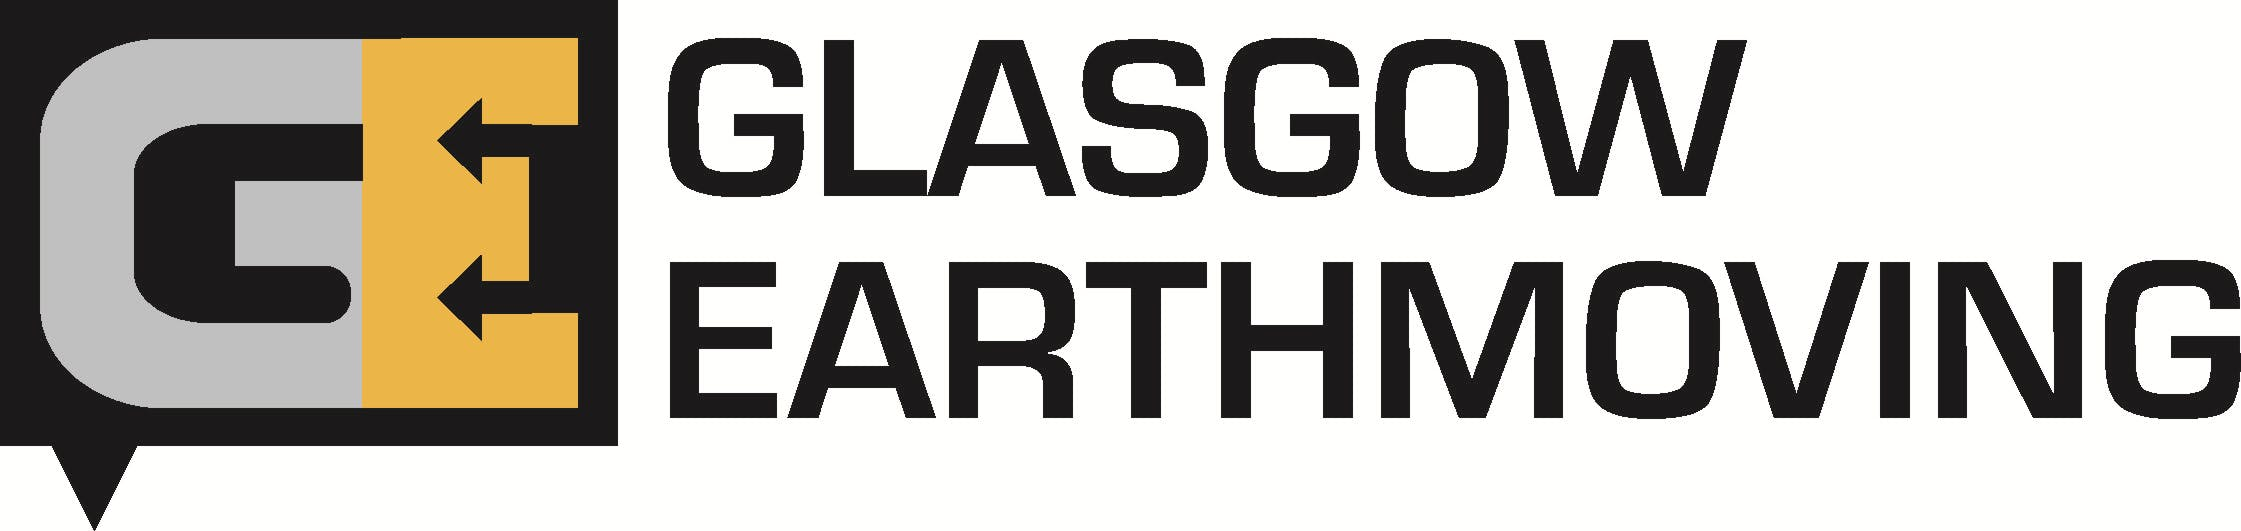 Glasgow Earthmoving